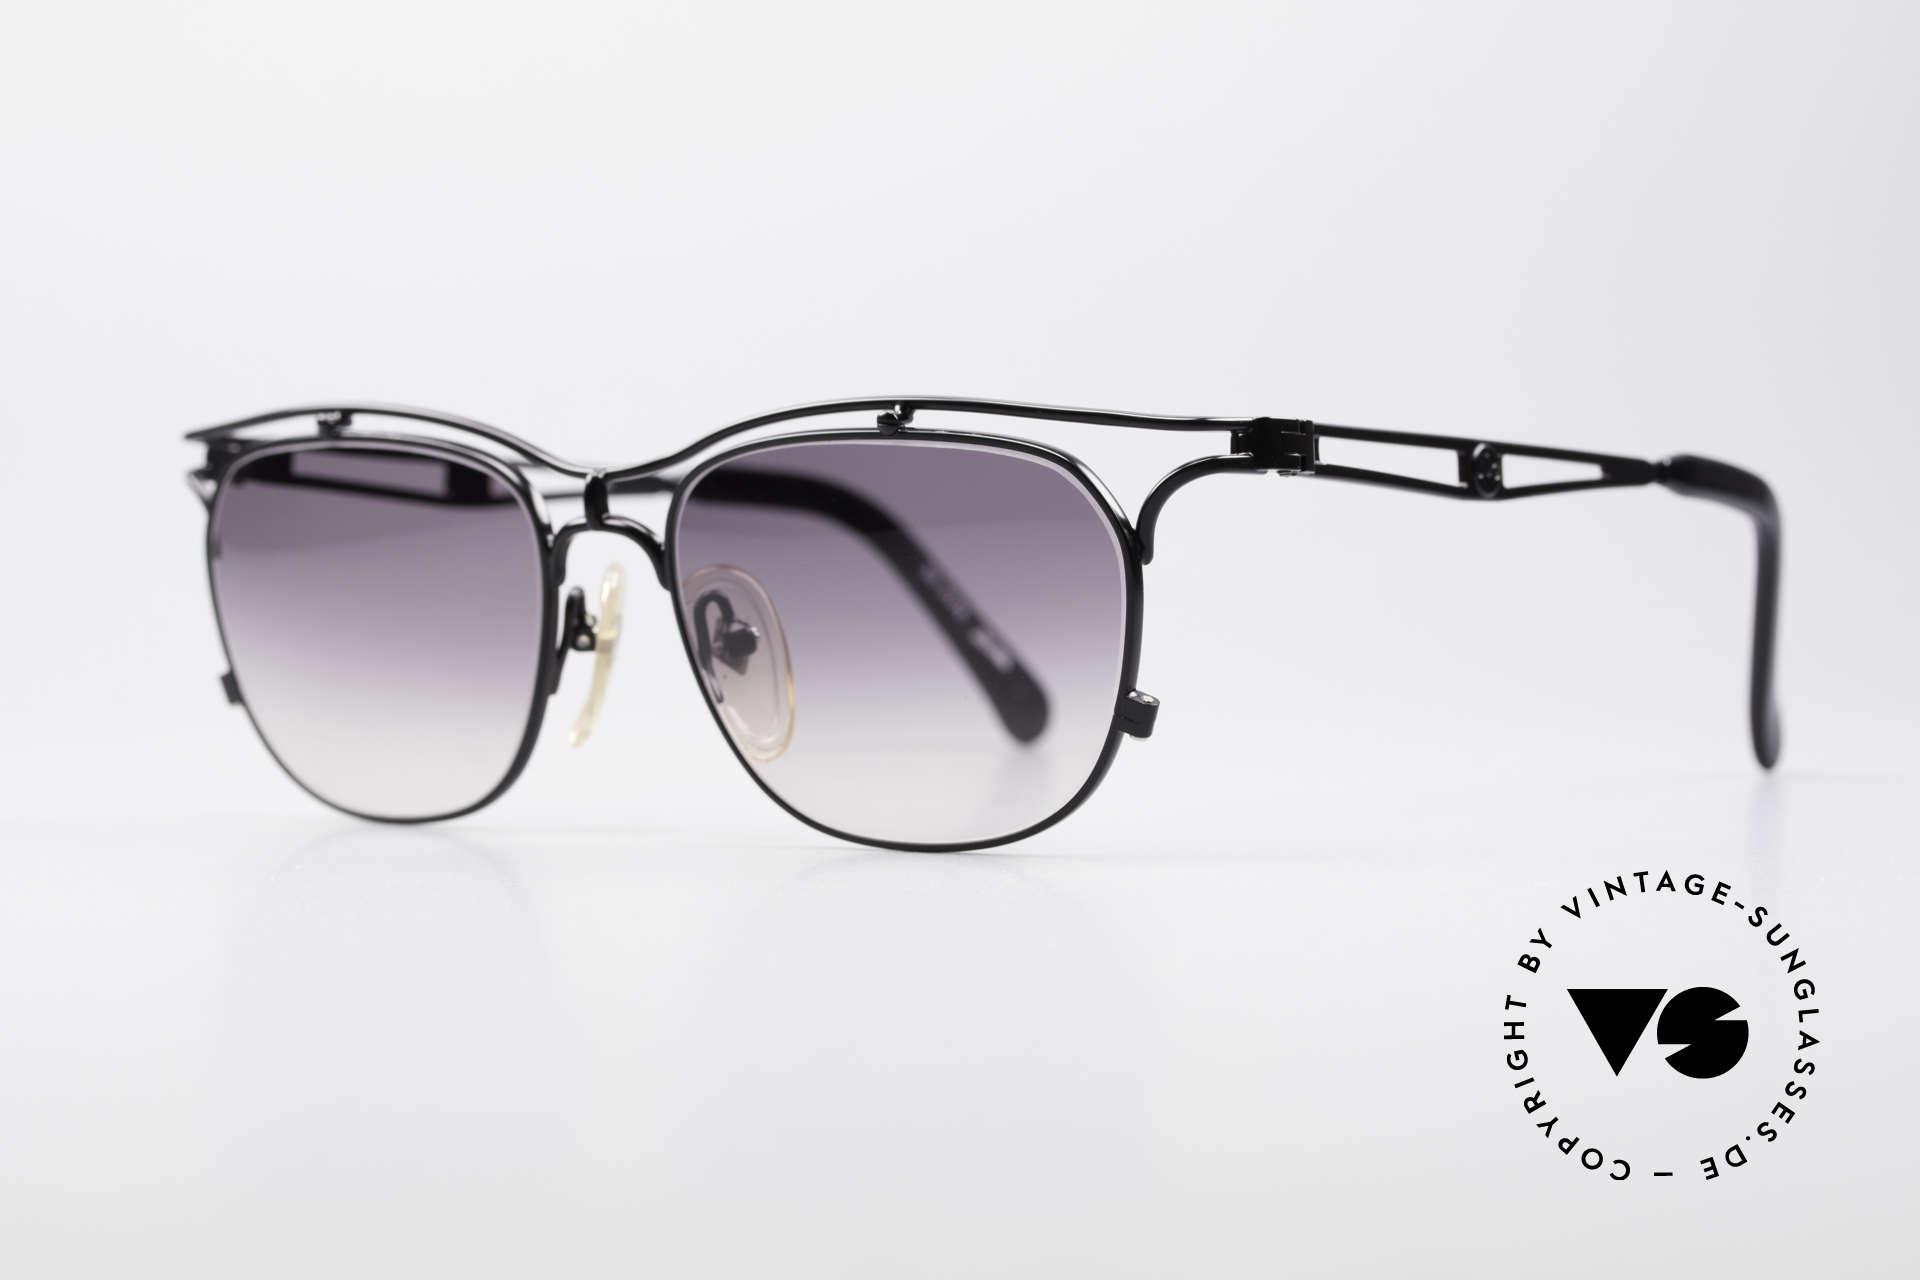 Jean Paul Gaultier 55-2178 No Retro JPG Vintage Frame, black metallic finish and gray-gradient sun lenses, Made for Men and Women